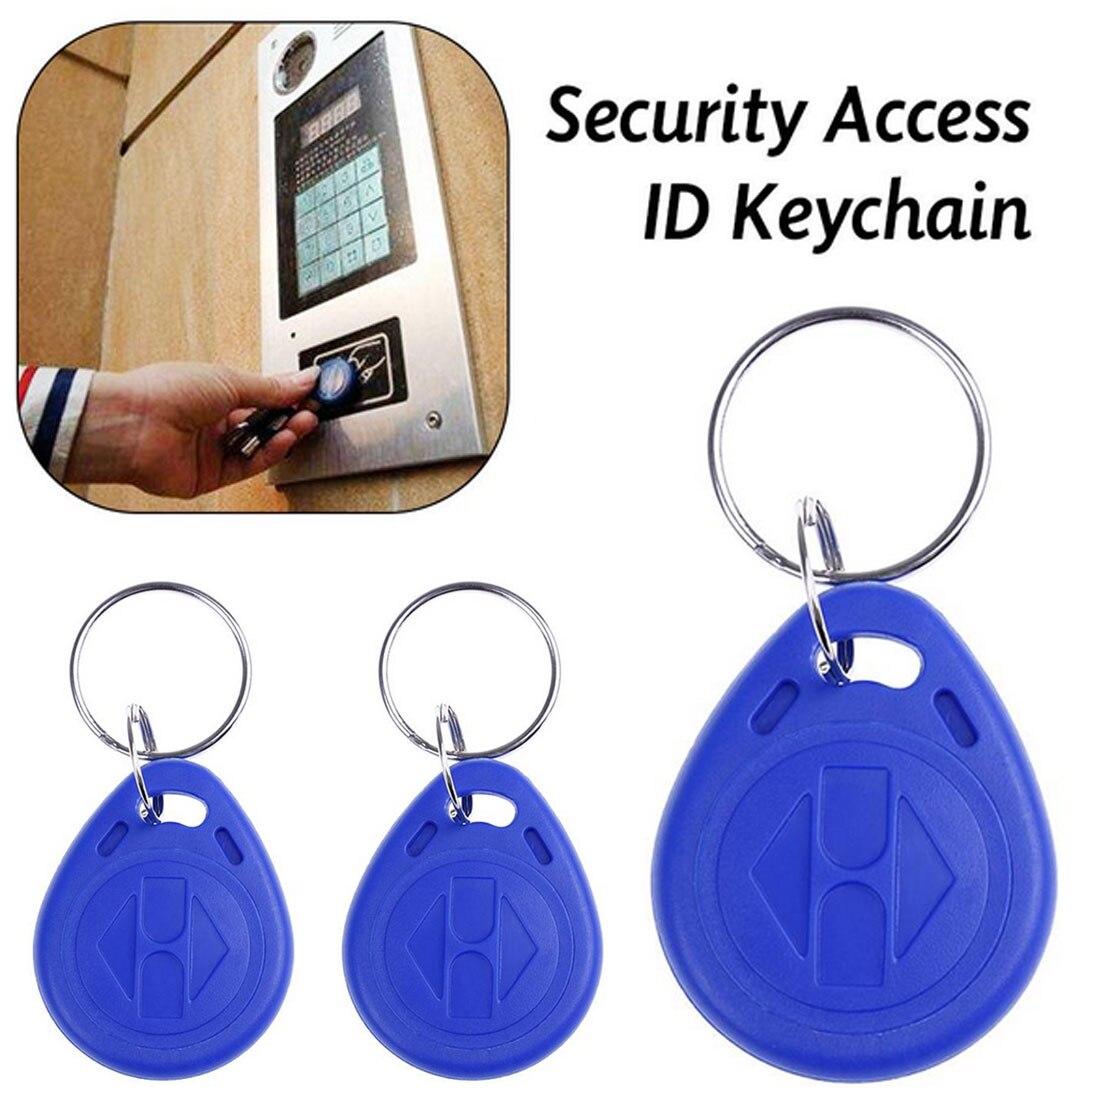 10 Pcs/lot TK4100 Copy Rewritable Writable Rewrite EM ID Keyfobs RFID Tag Key Ring Card 125KHZ Proximity Token Access Duplicate